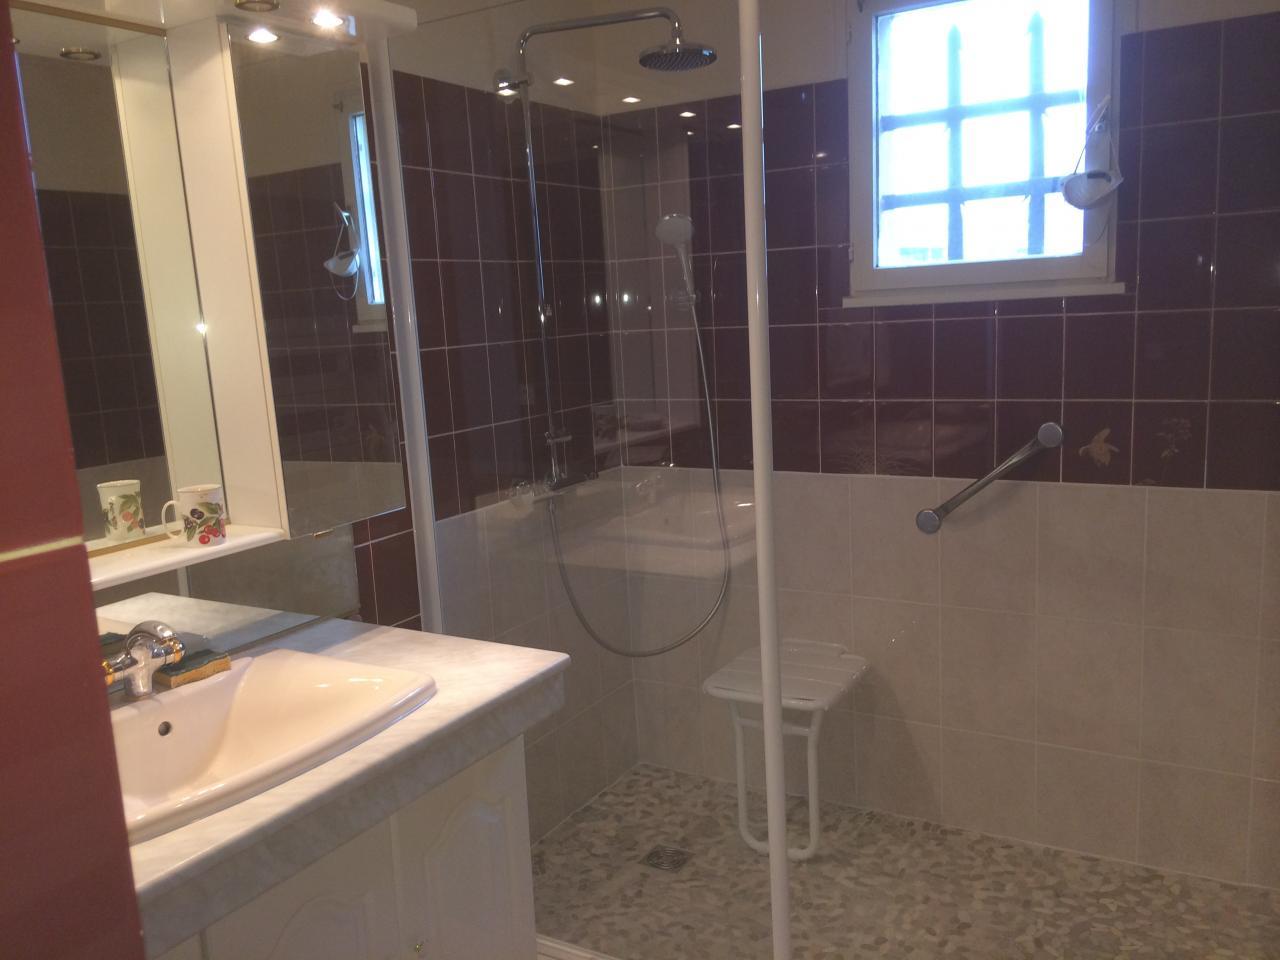 Salle de bains - Barre de maintien salle de bain ...